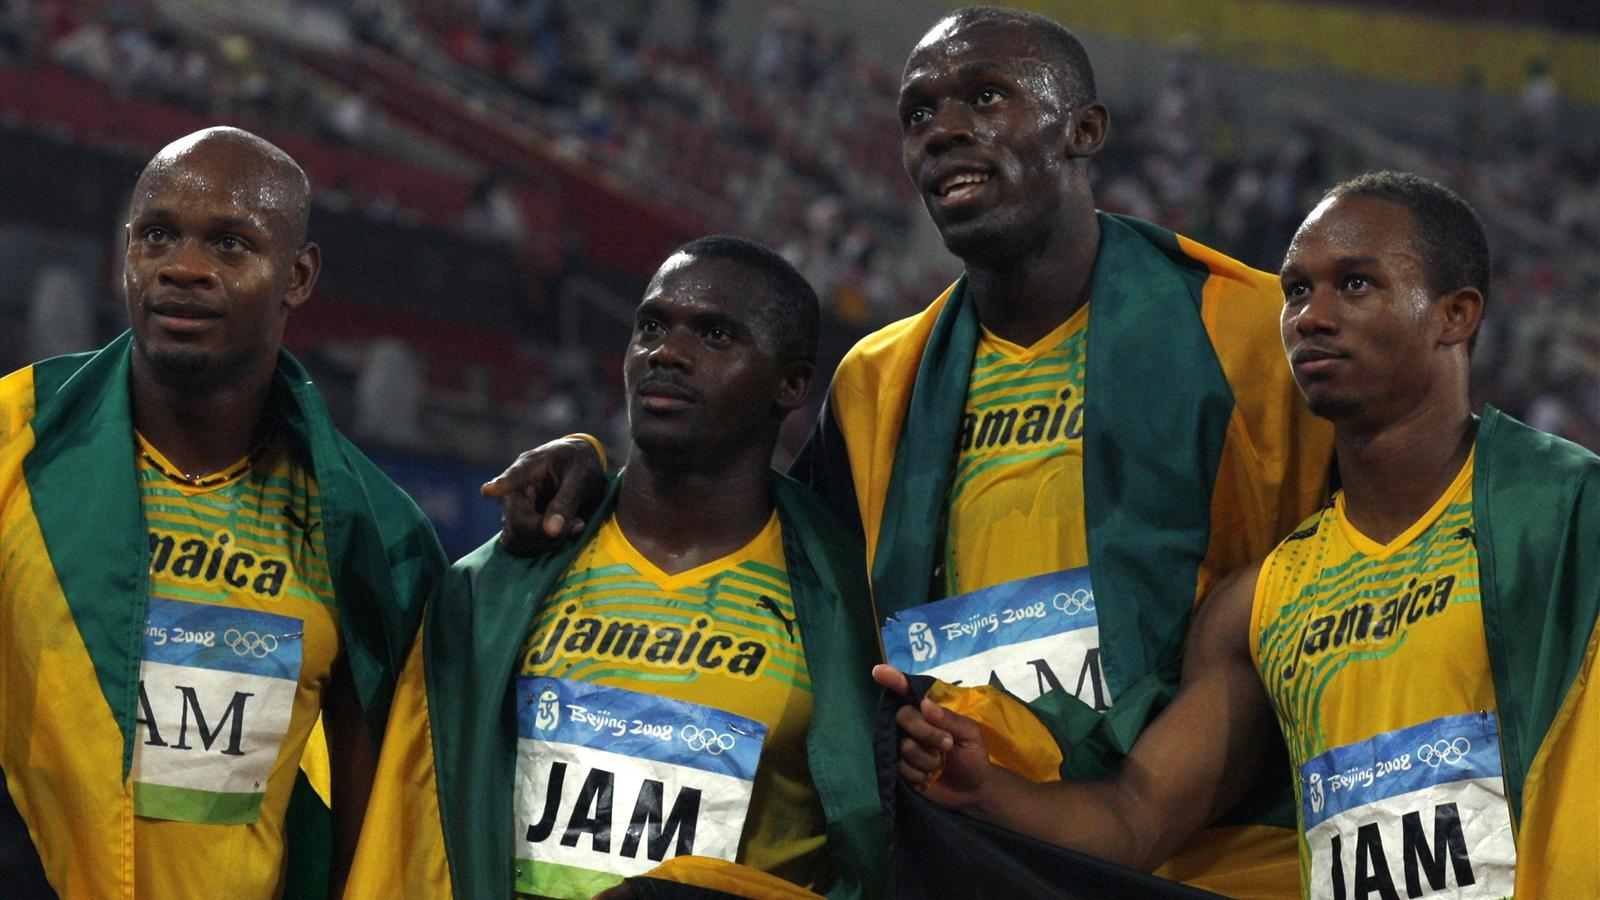 jamaican gold jamaican sprinters